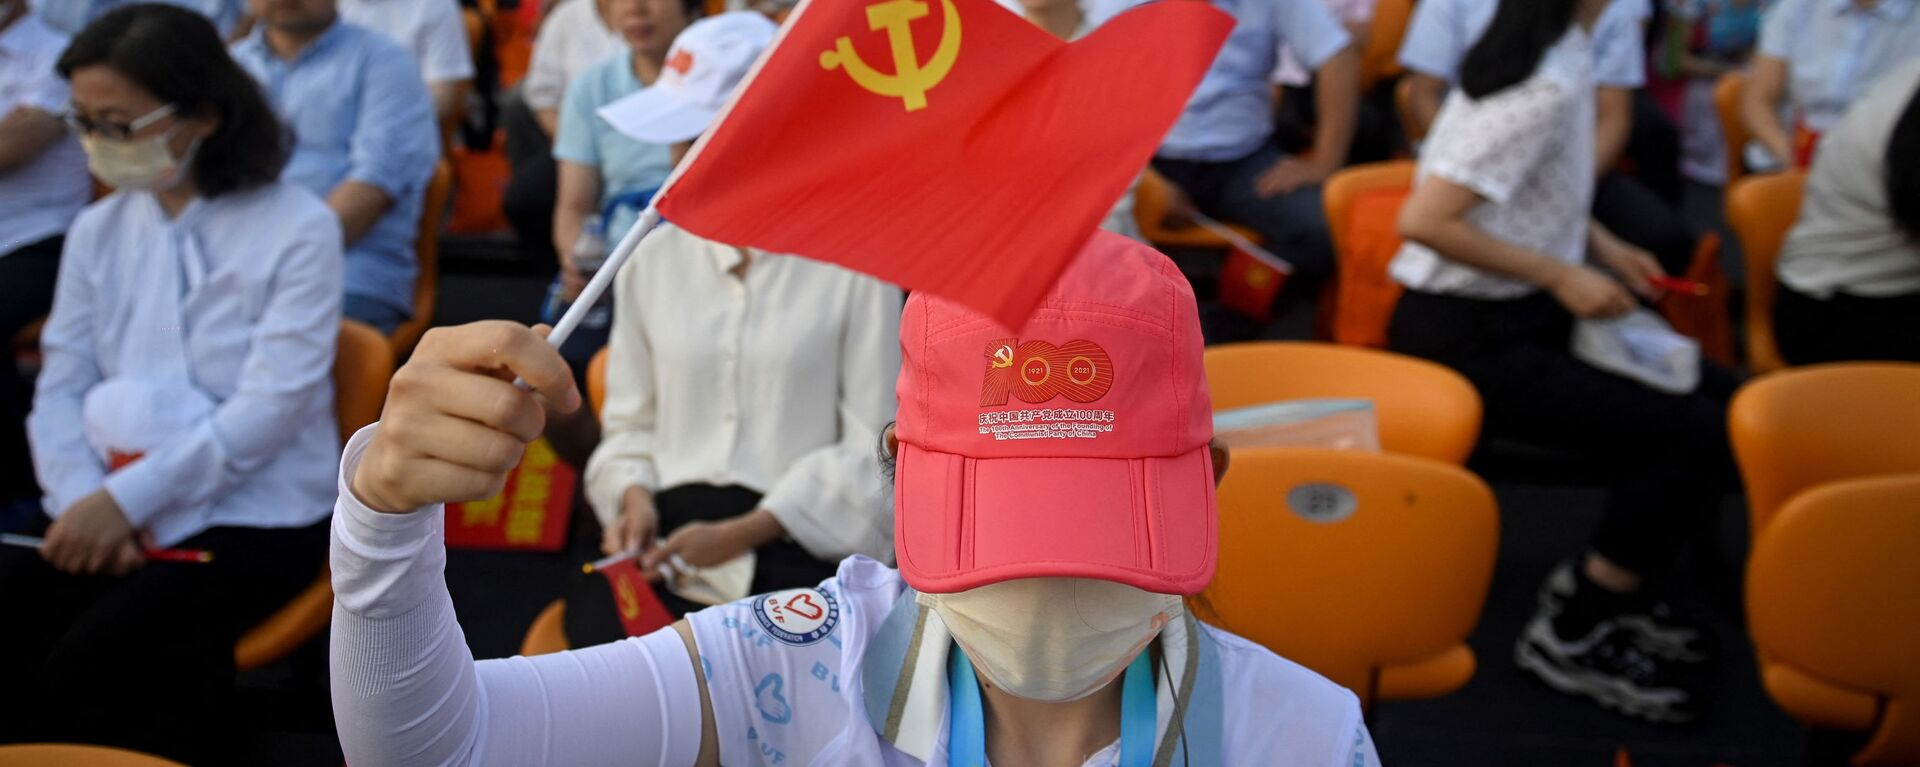 Mujer con la bandera del Partido Comunista de China - Sputnik Mundo, 1920, 01.07.2021